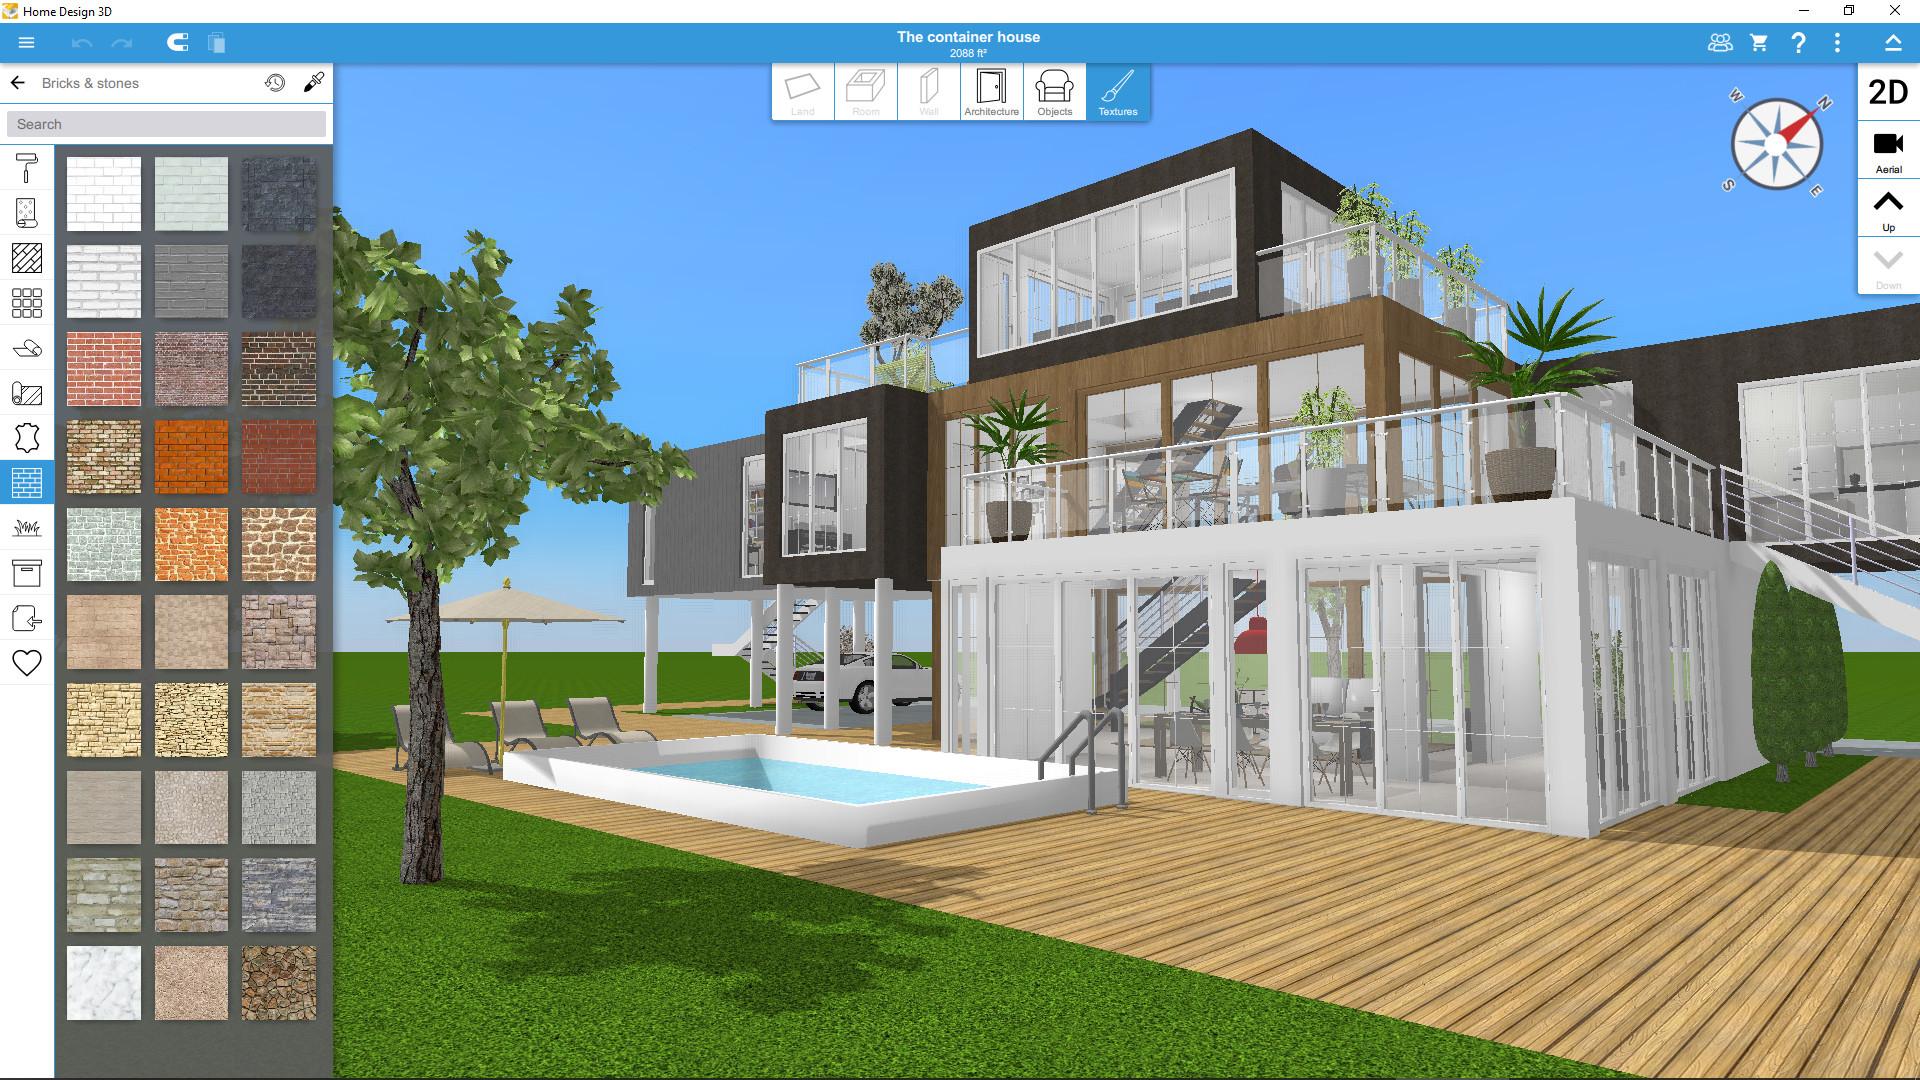 Home Design 20D on Steam